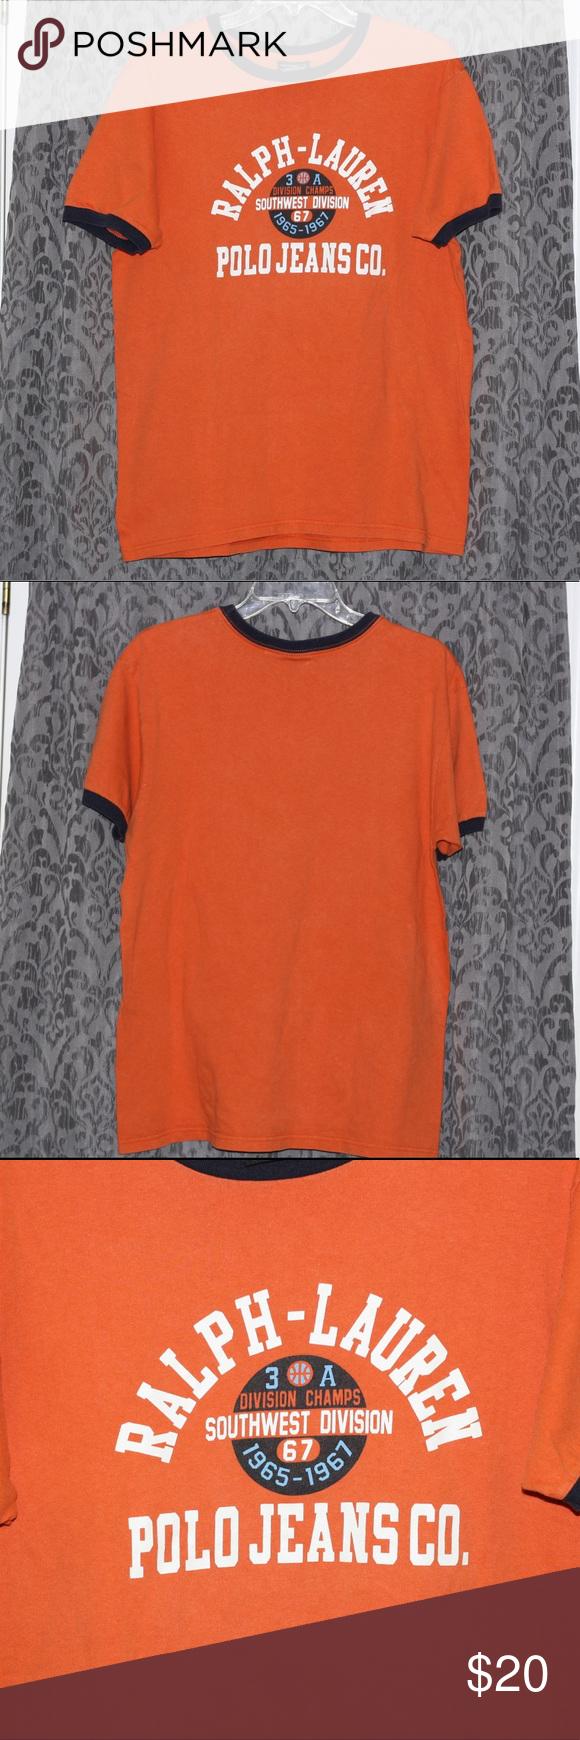 5051f620e8ac8 Vtg 90s POLO JEANS CO T shirt orange ringer tee Vintage Polo Jeans ...